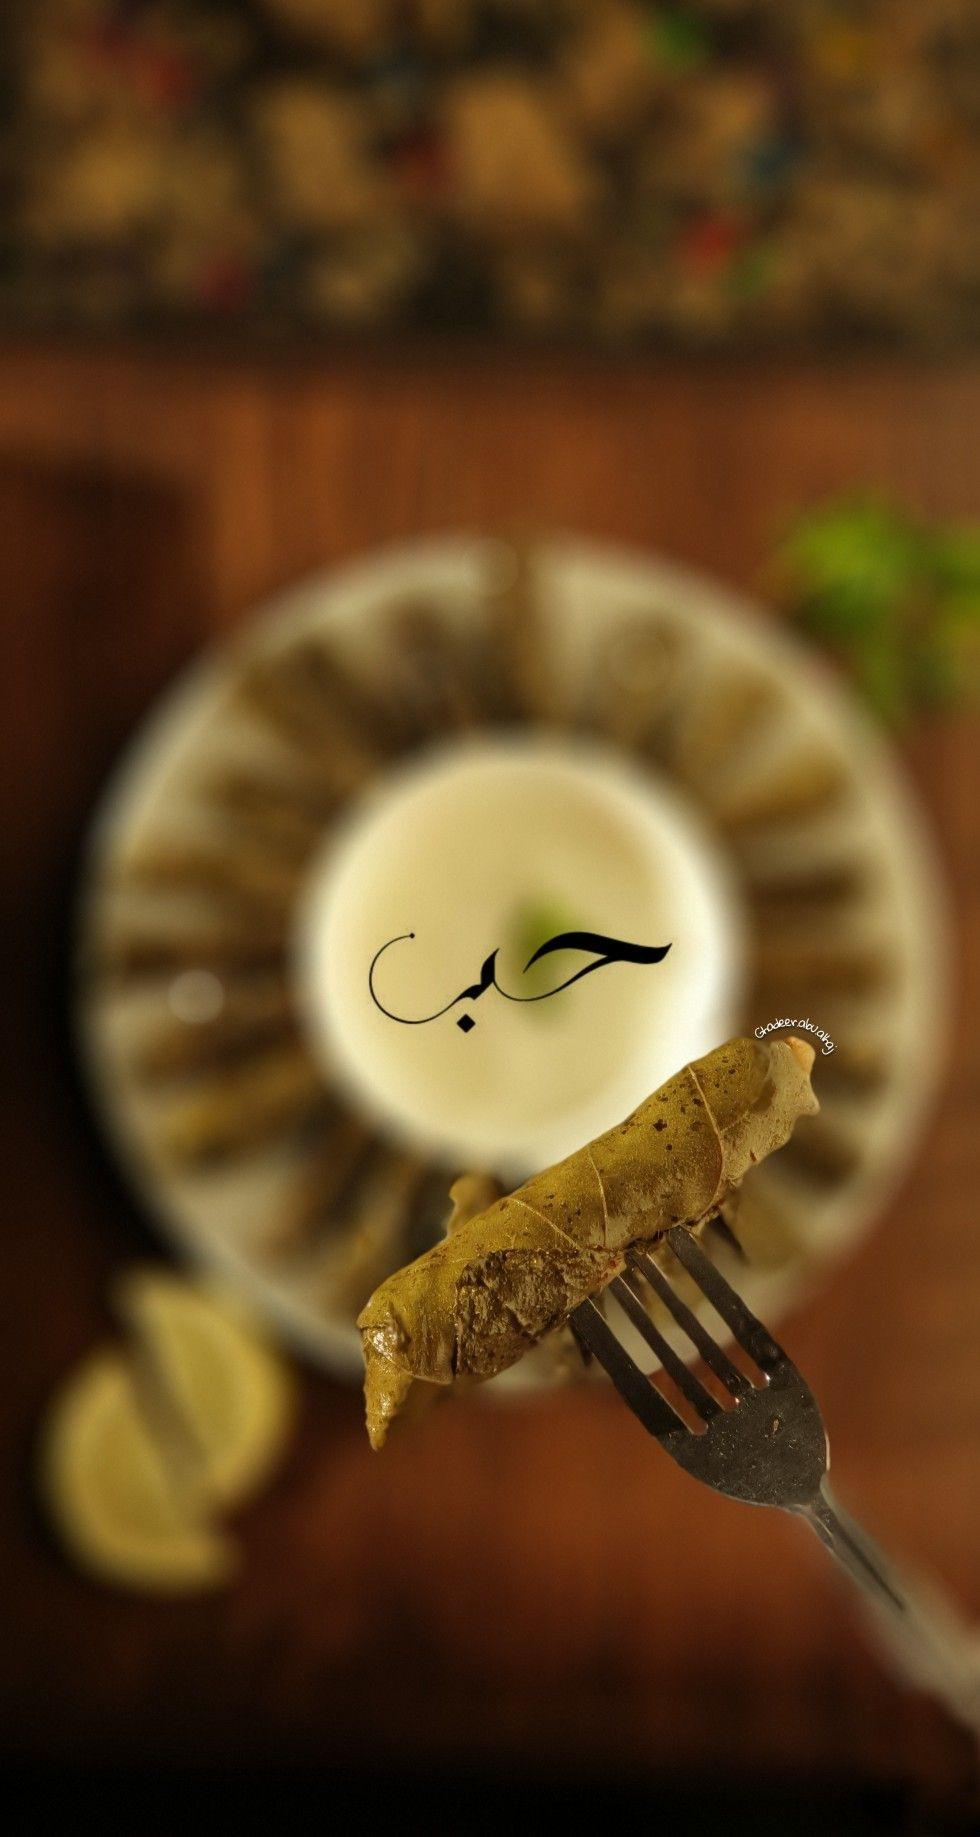 ورق عنب Aesthetic Food Instagram Food